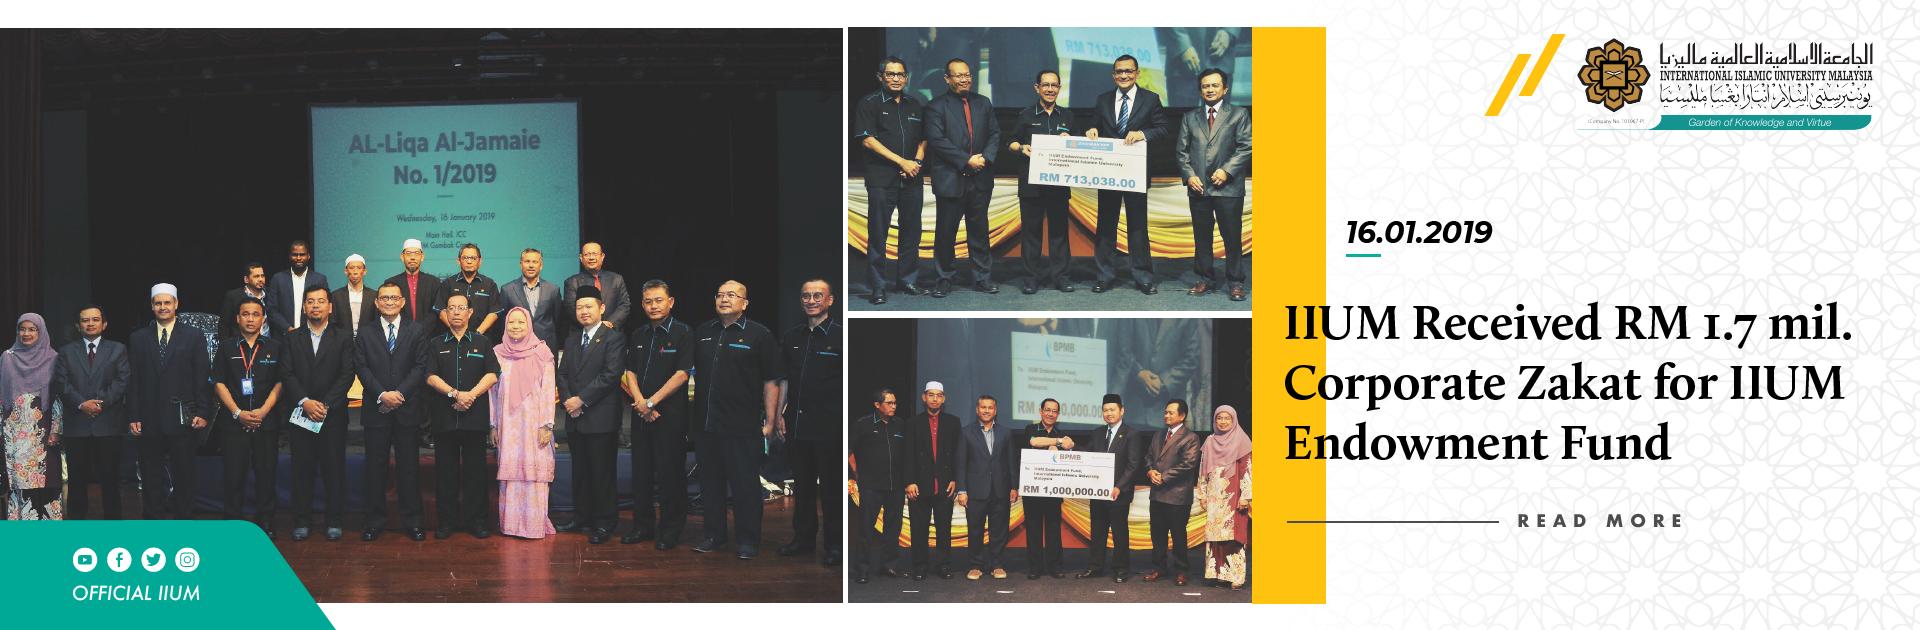 IIUM Received 1.7mil Corporate Zakat for IIUM Endowment Fund